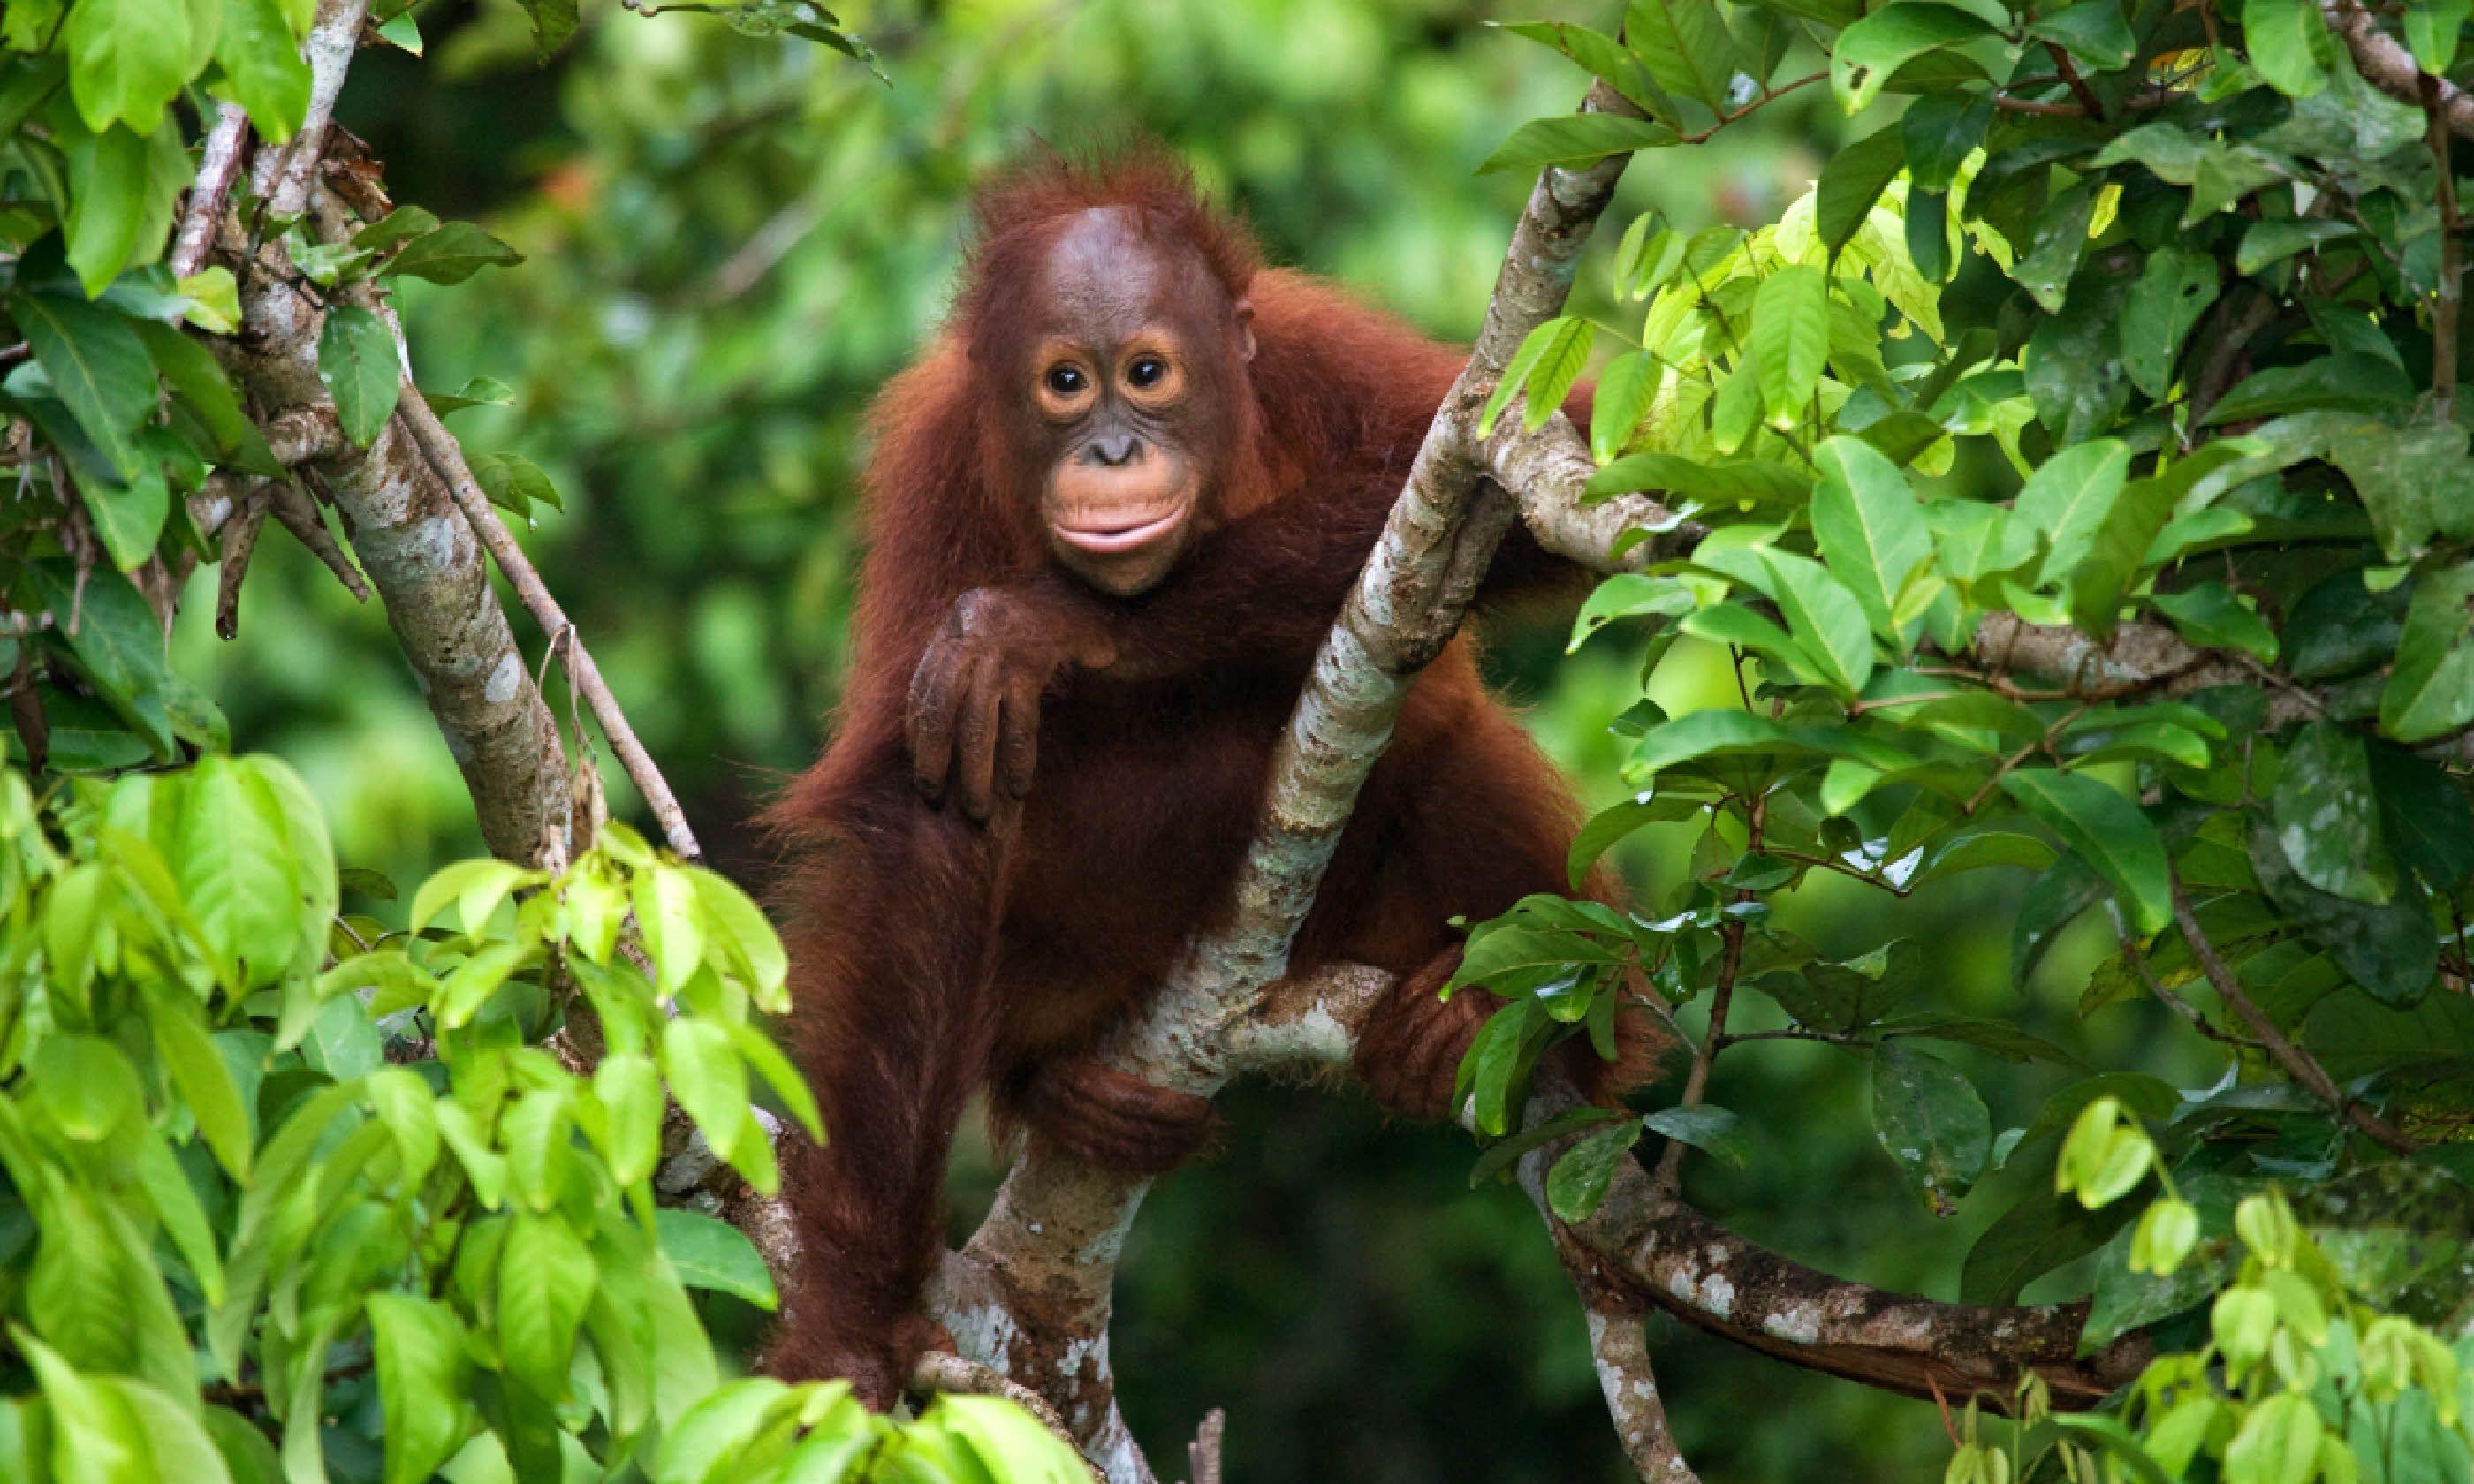 A baby orangutan in Indonesia (Shutterstock)